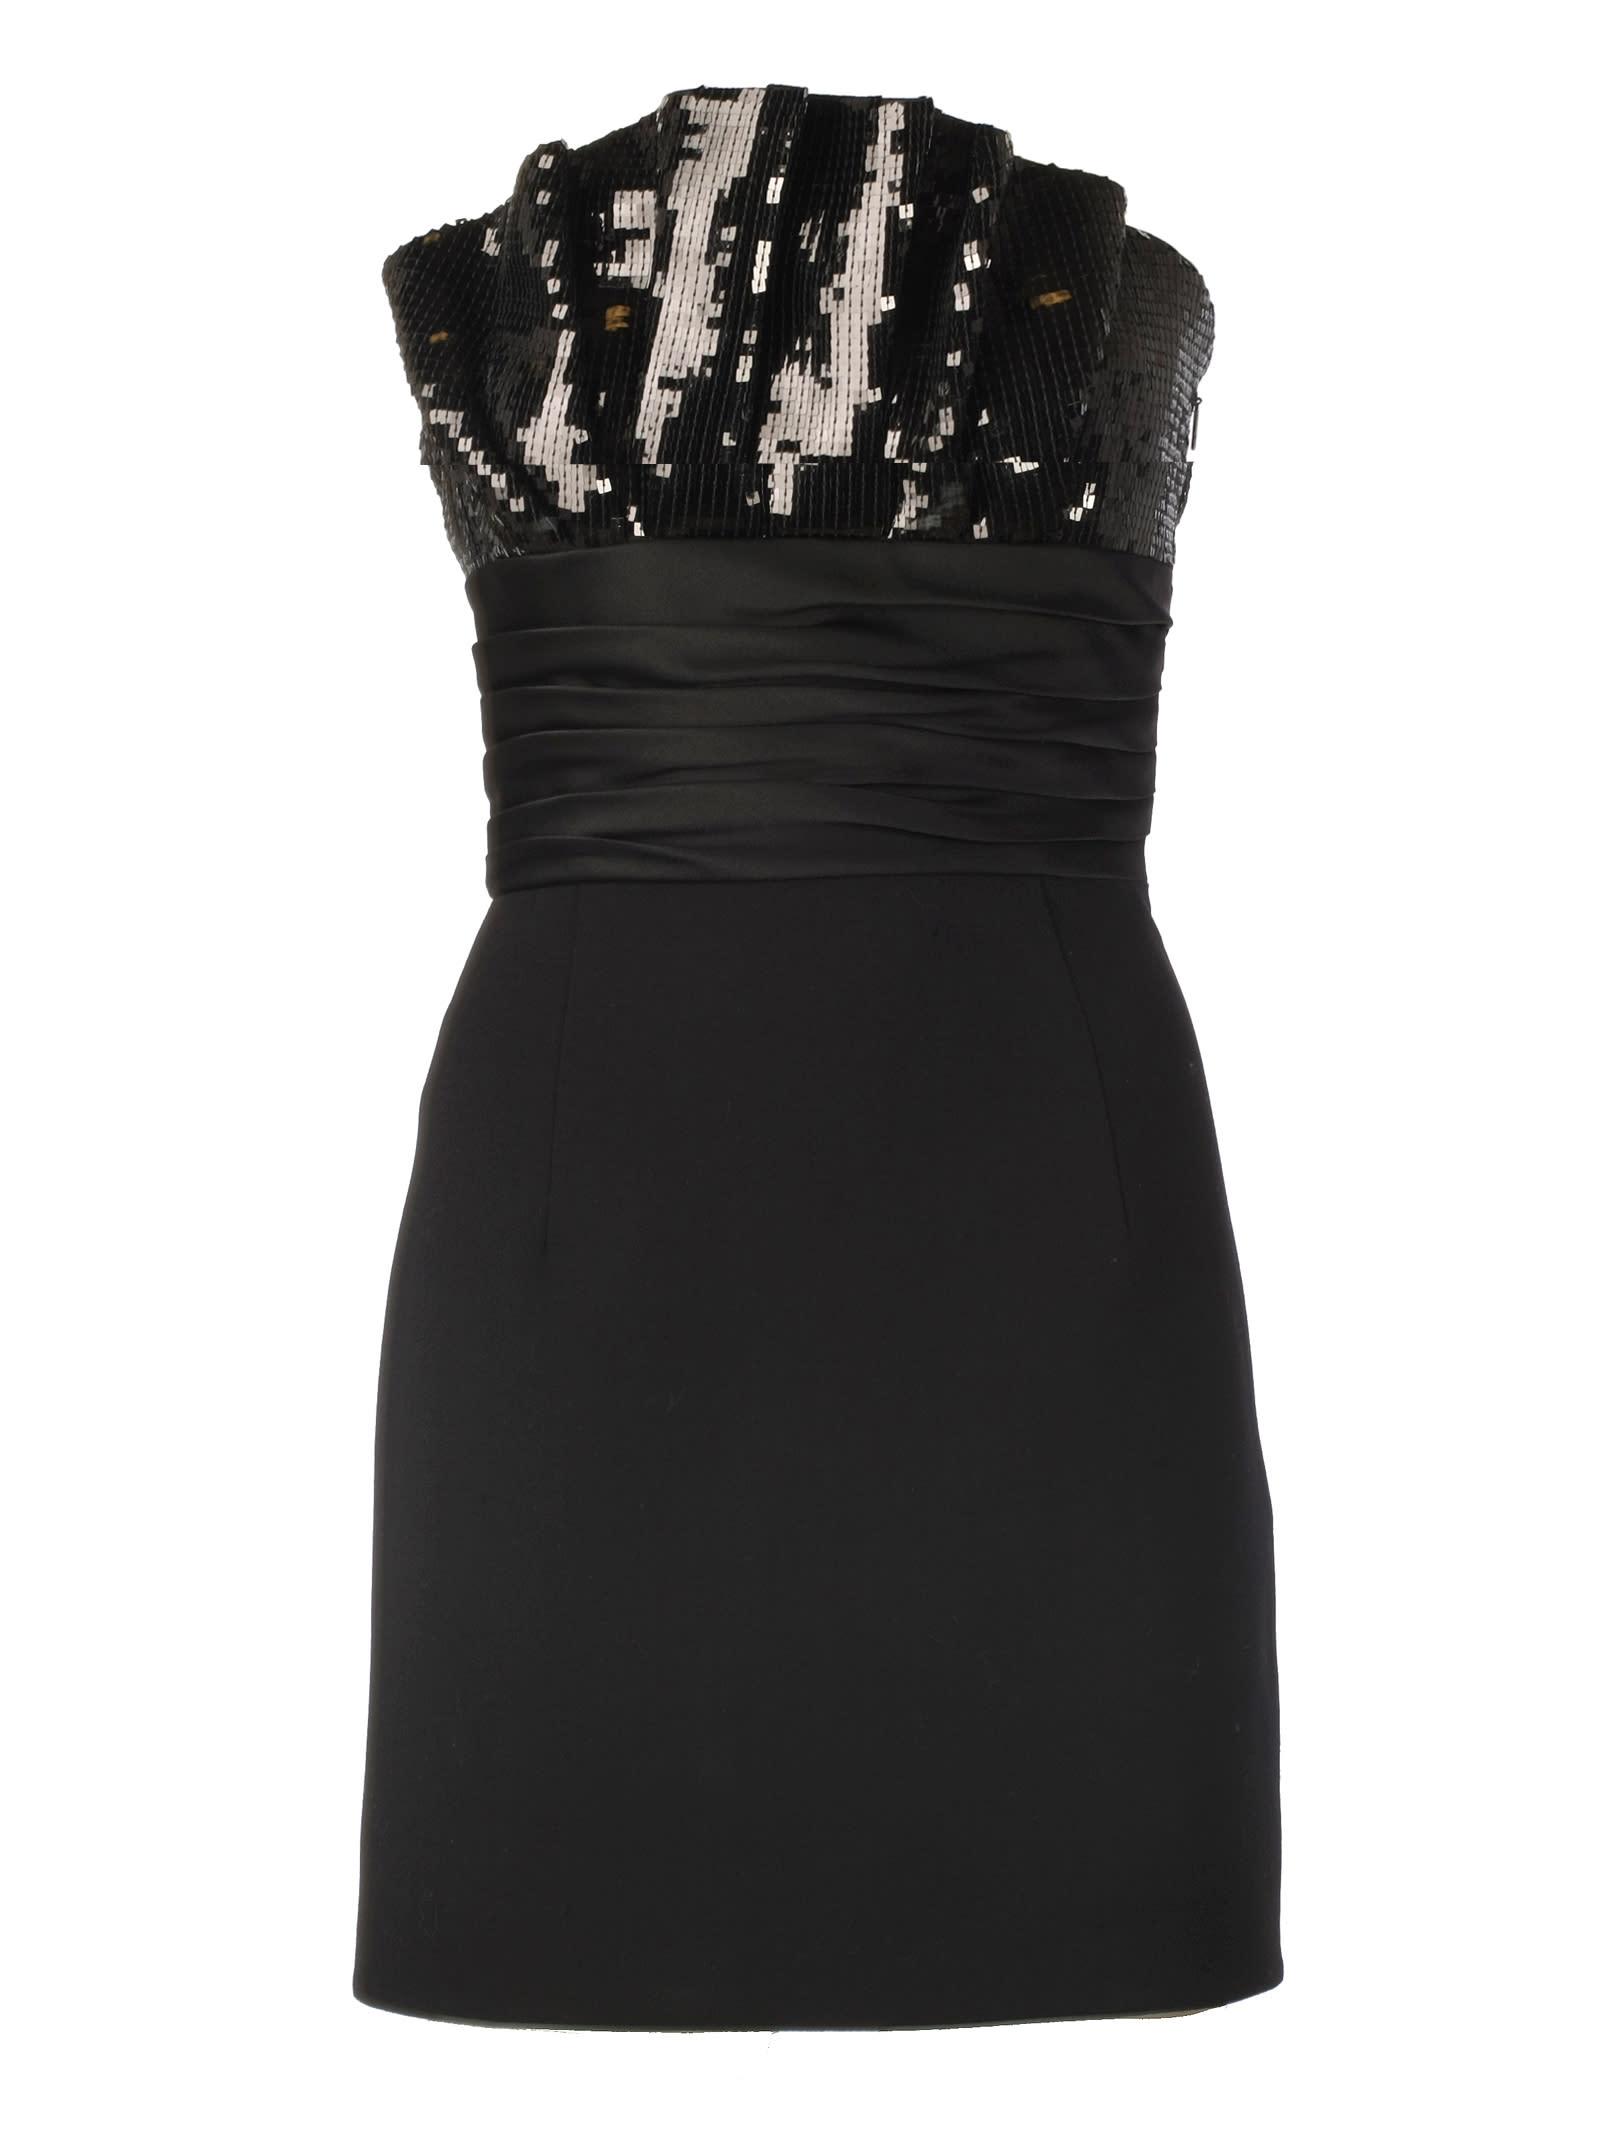 Saint Laurent Ruffled Bustier Mini Dress